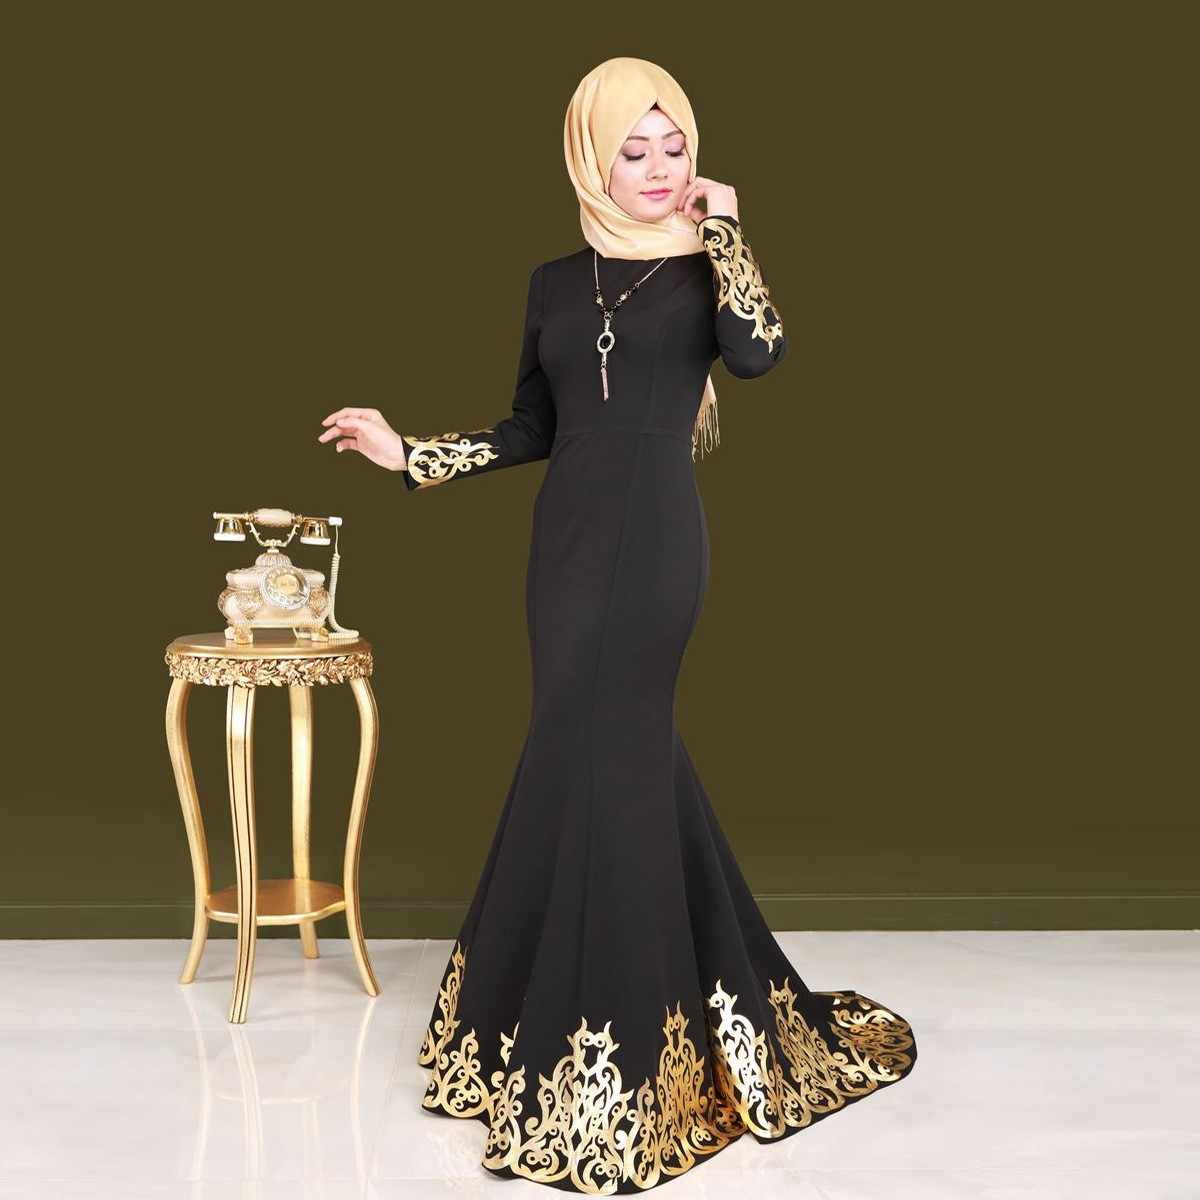 Palace Style Bronzing Muslim Robes long-sleeved Waist Fishtail Dress Round Neck Long Dress Fashion Vintage Casual Dresses